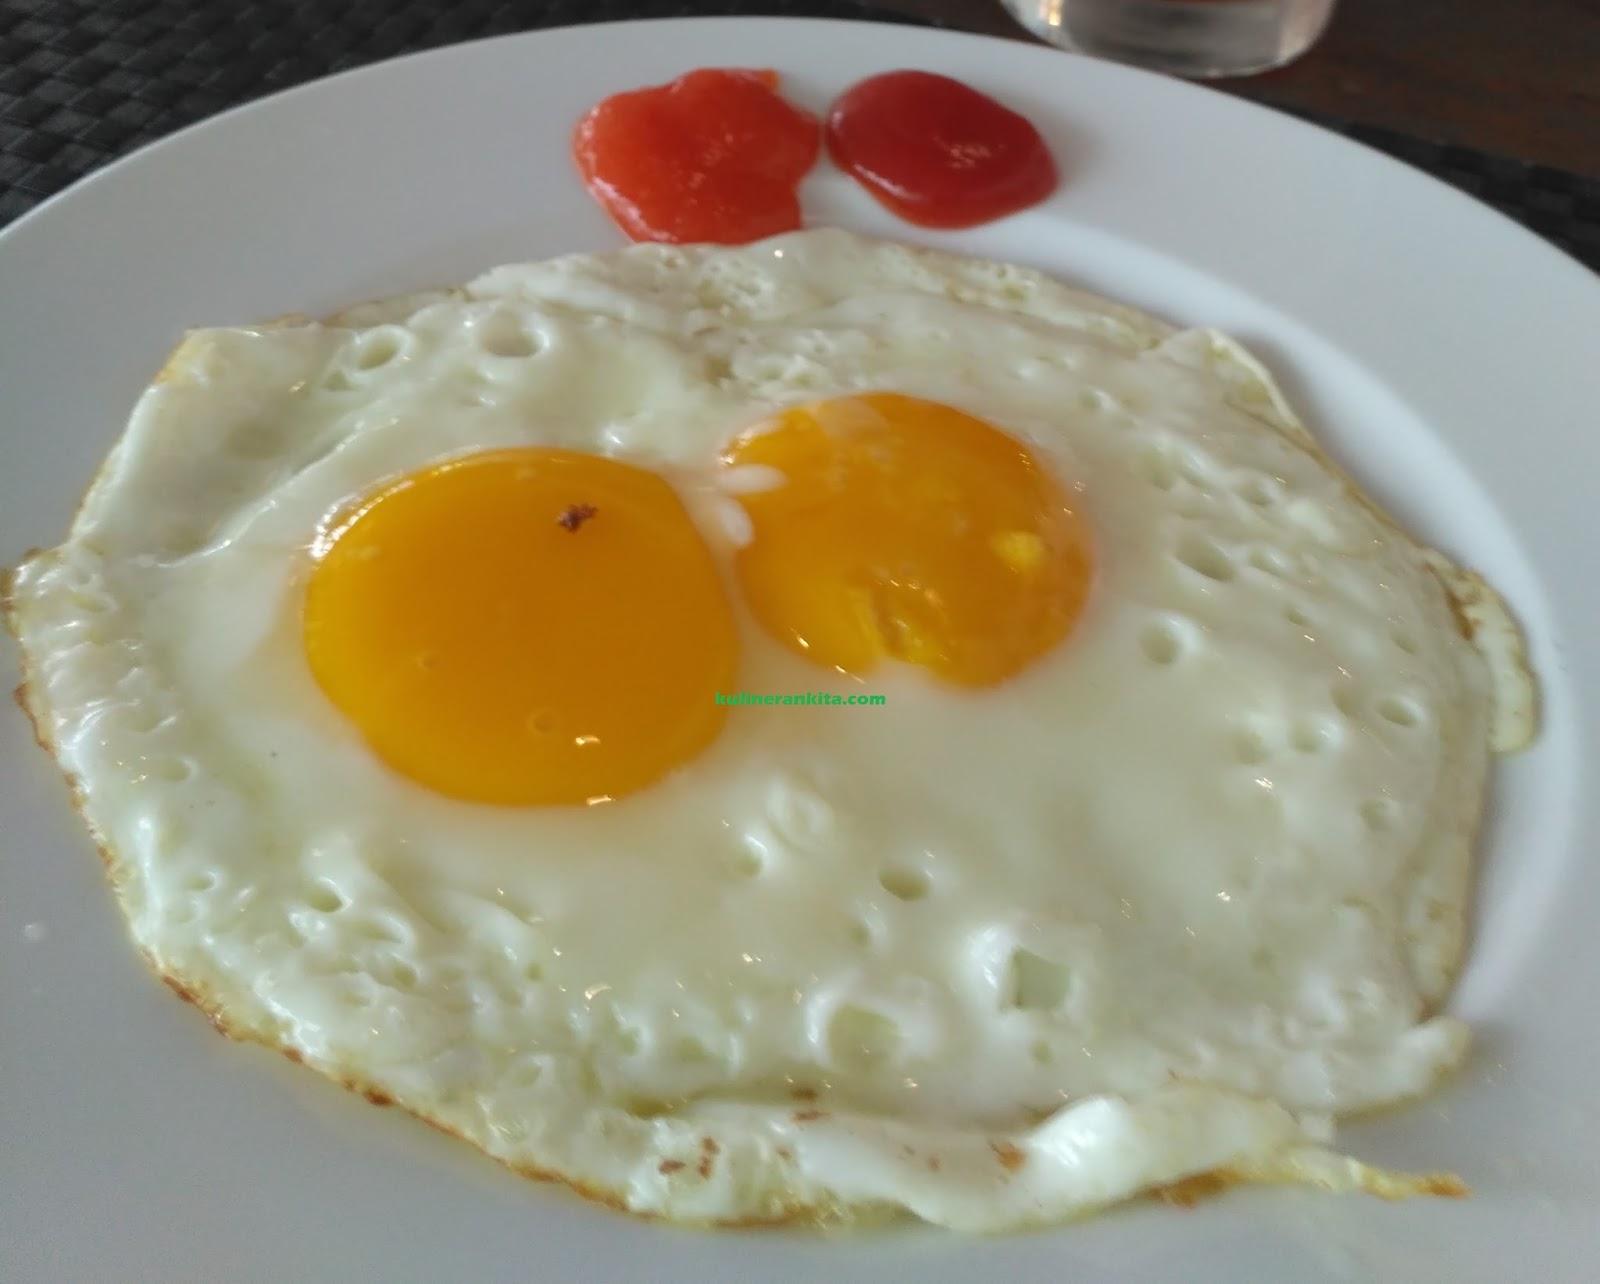 Goreng telur ceplok